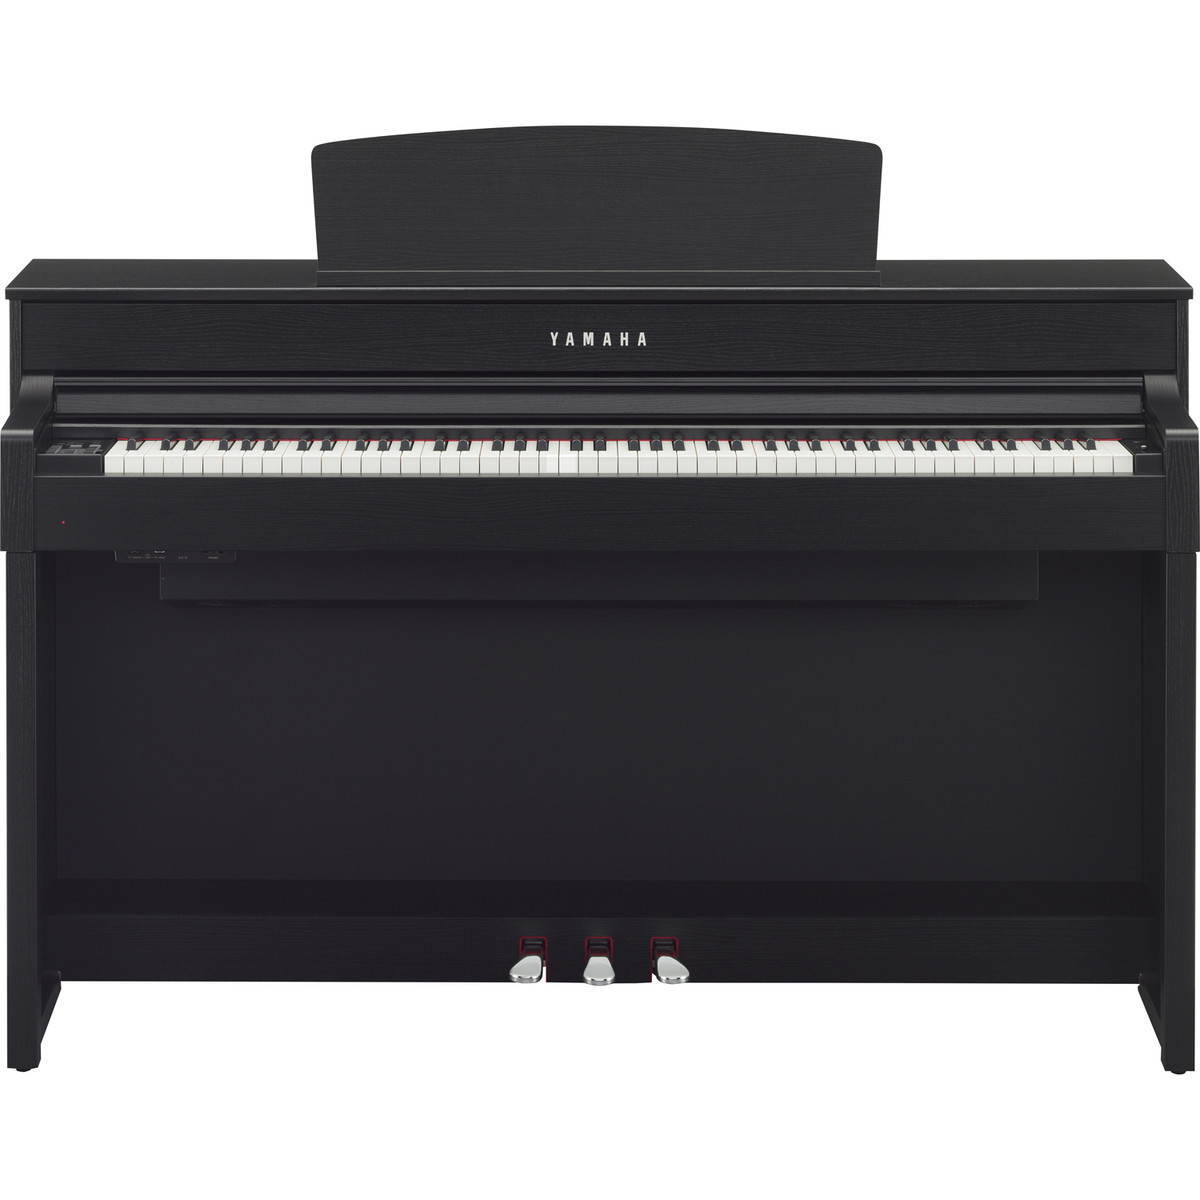 What Is The Value Of A Yamaha Clavinova Piano